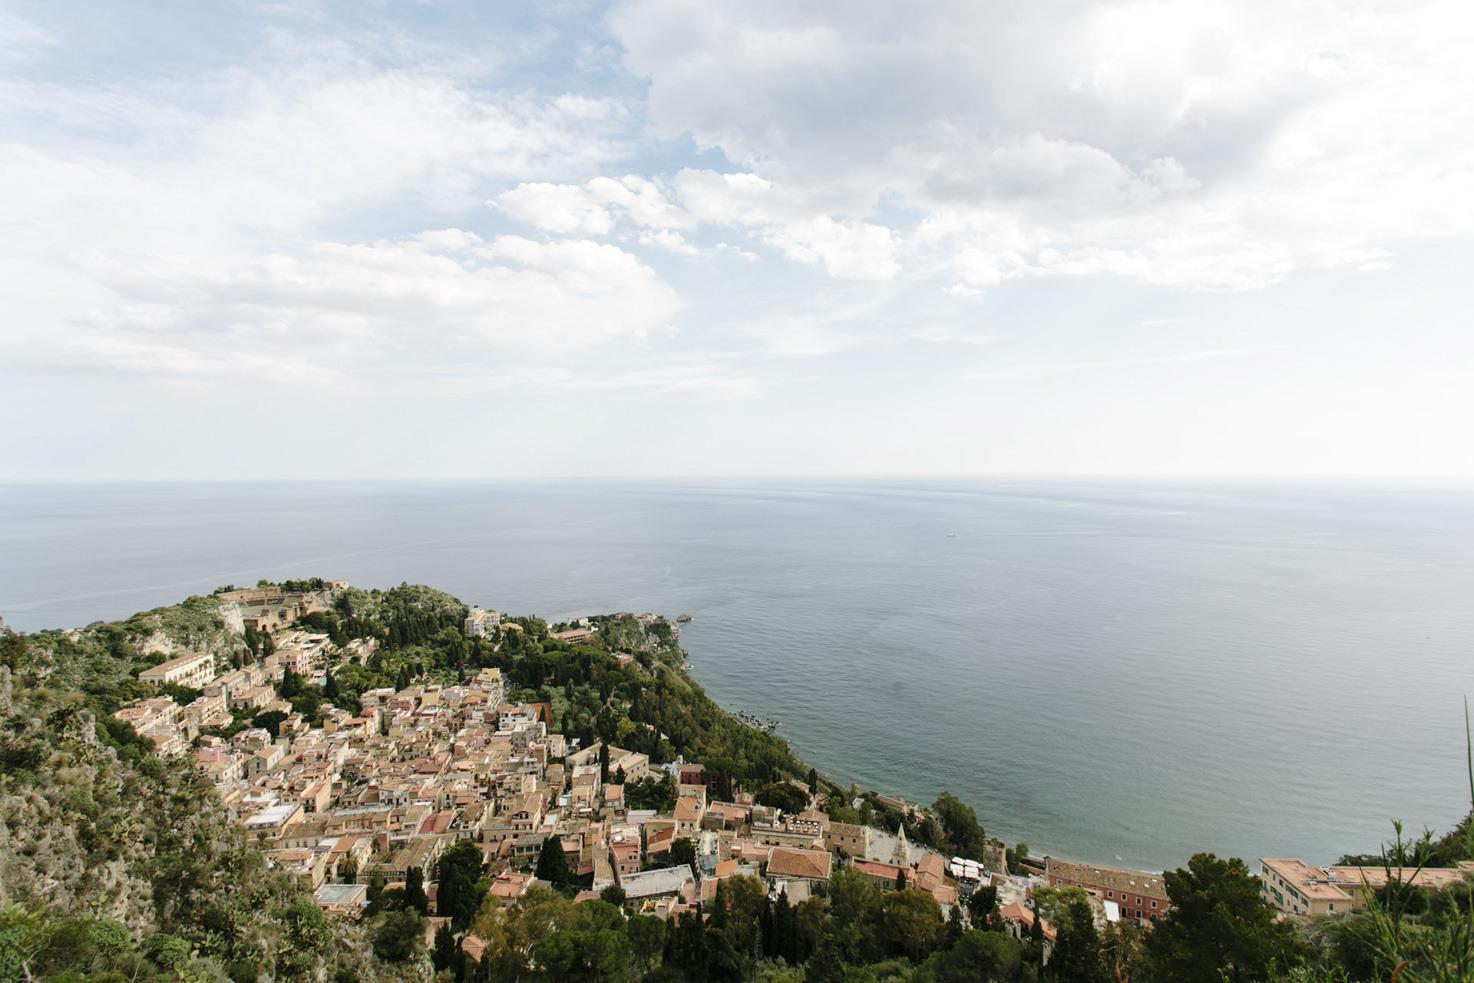 Aerial view of Taormina in Sicily